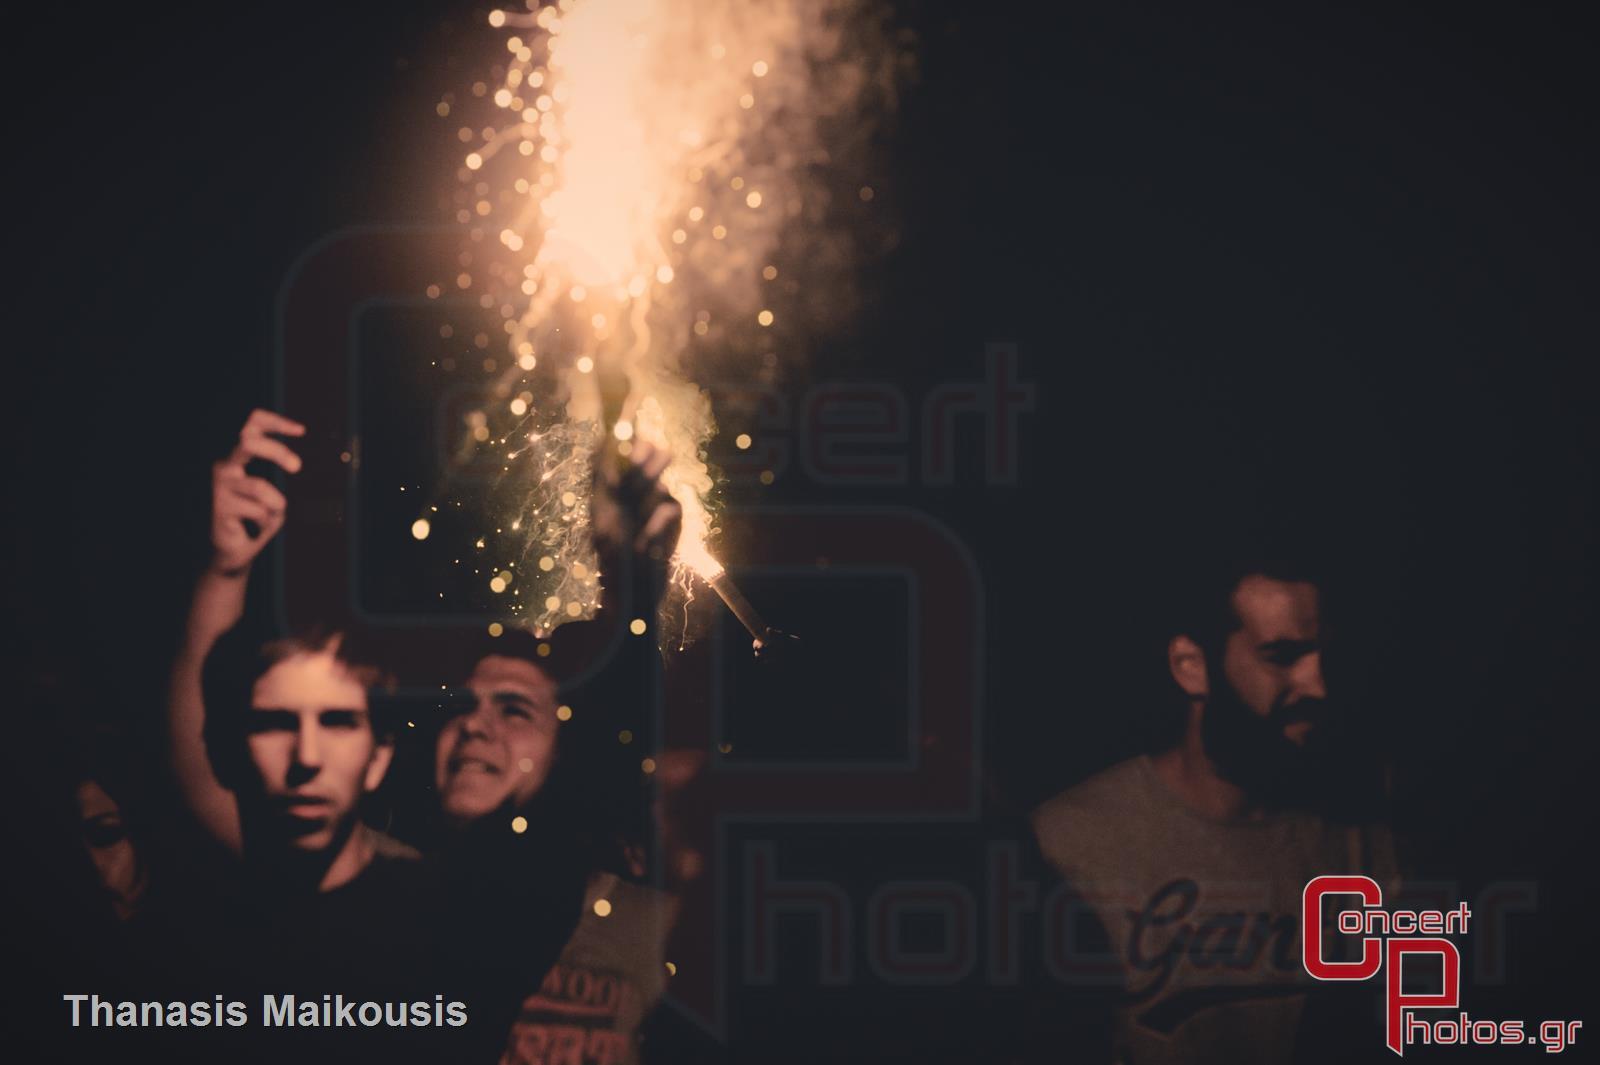 Active Member - Τραγούδα μας να φύγει το σκοτάδι- photographer: Thanasis Maikousis - concertphotos_-4845